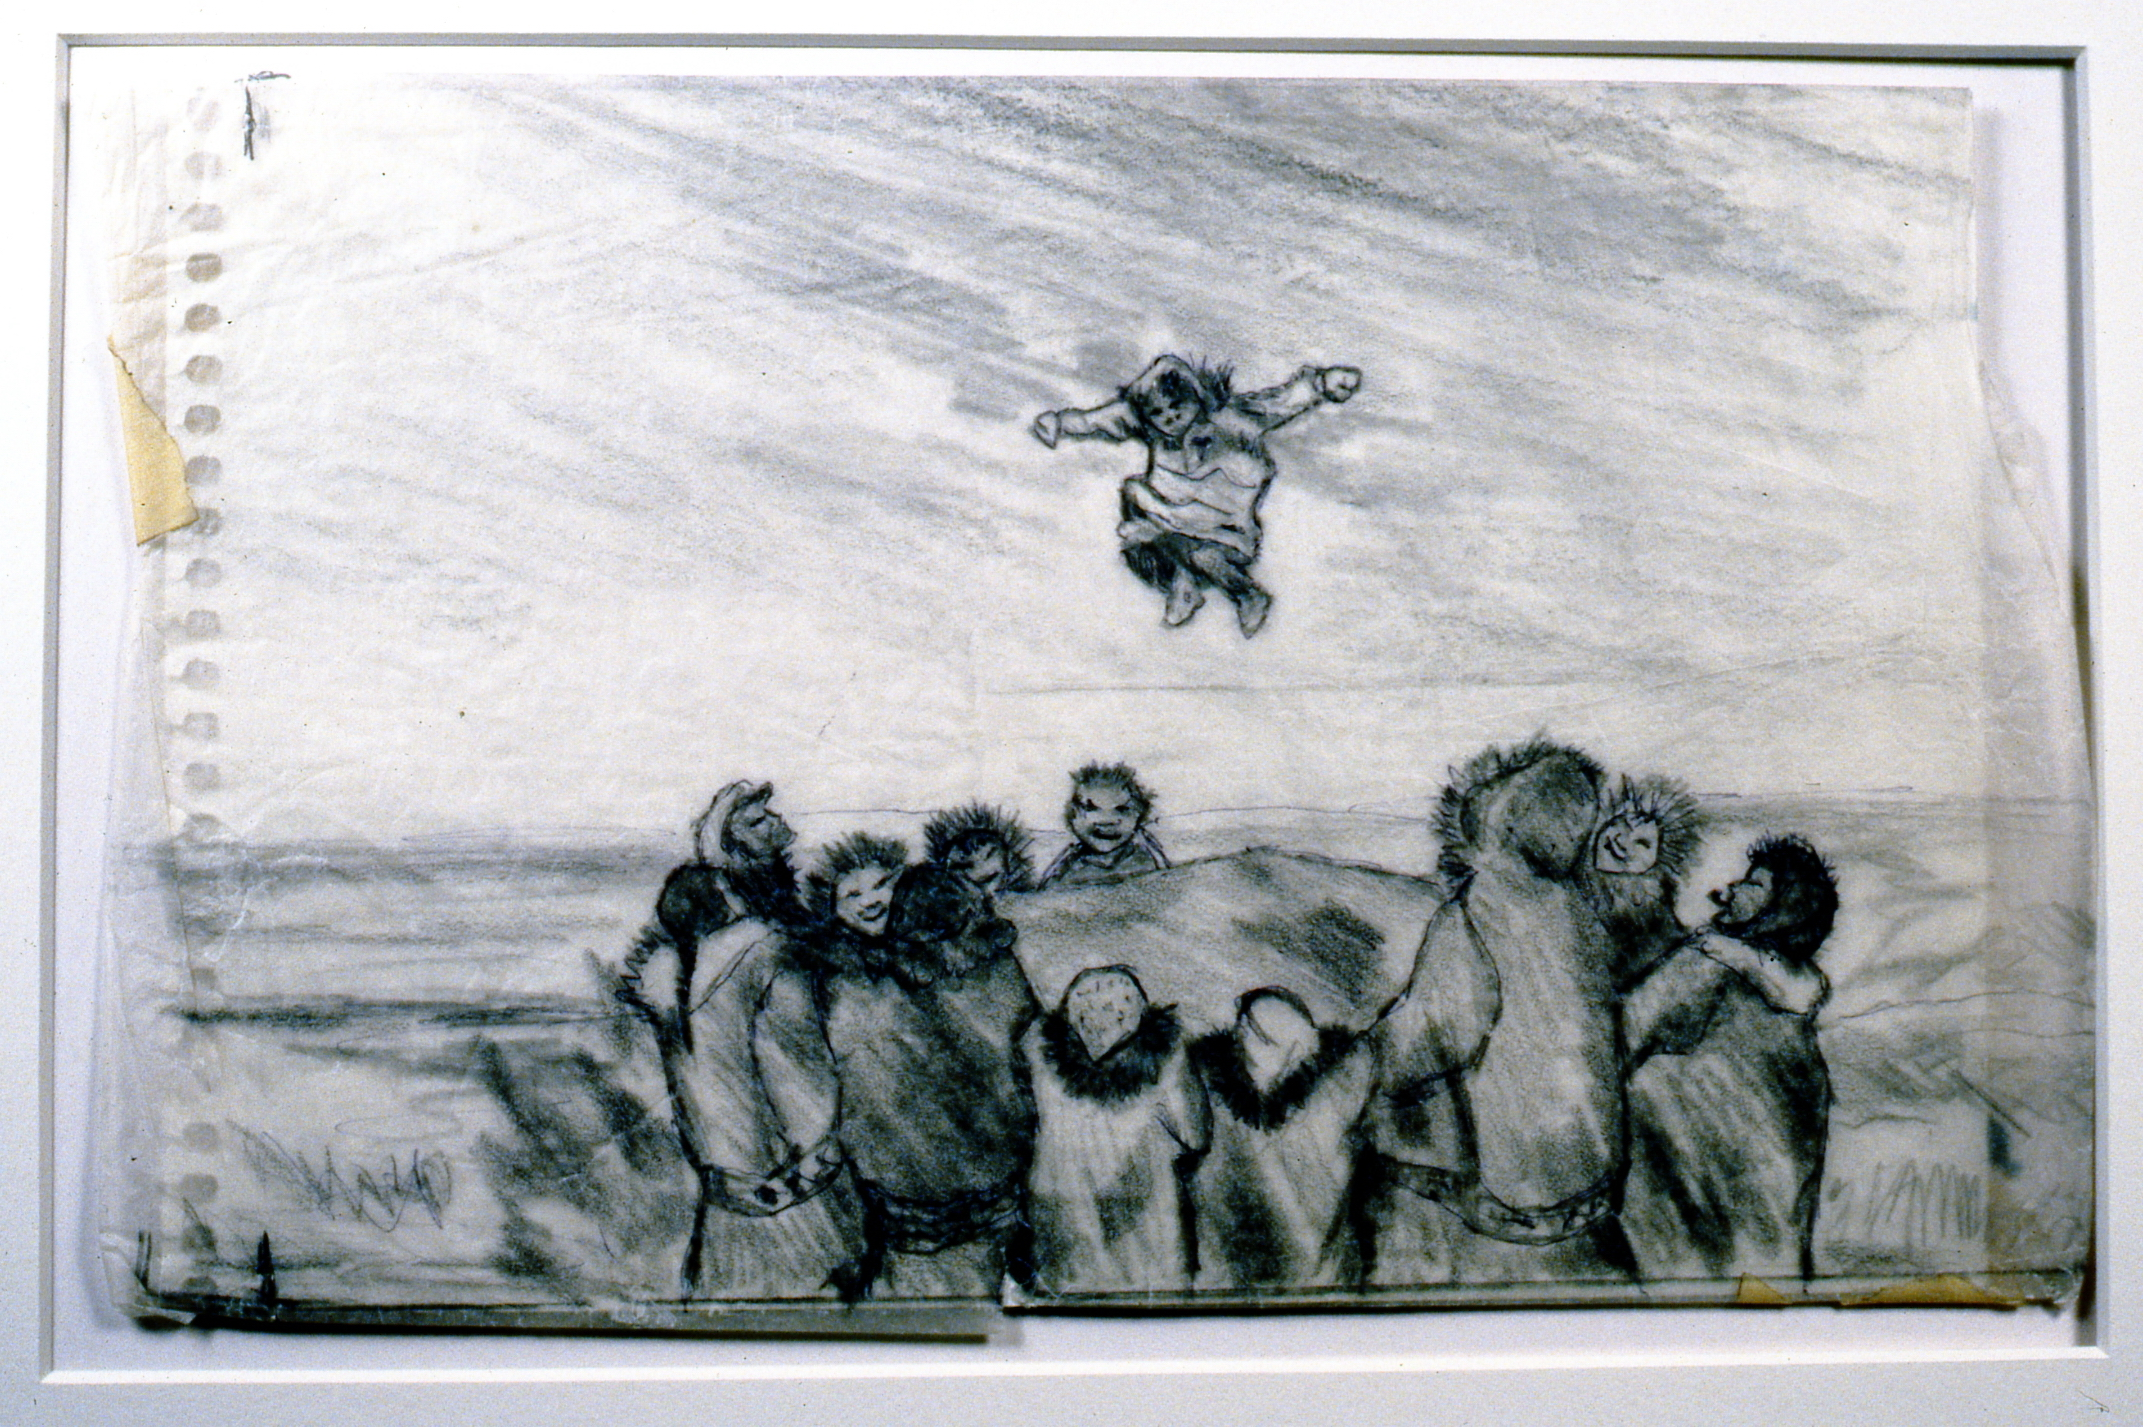 Blanket Toss , 1986, Minn Sjølseth, sketch, 15 x 25 cm, 1996.02.18